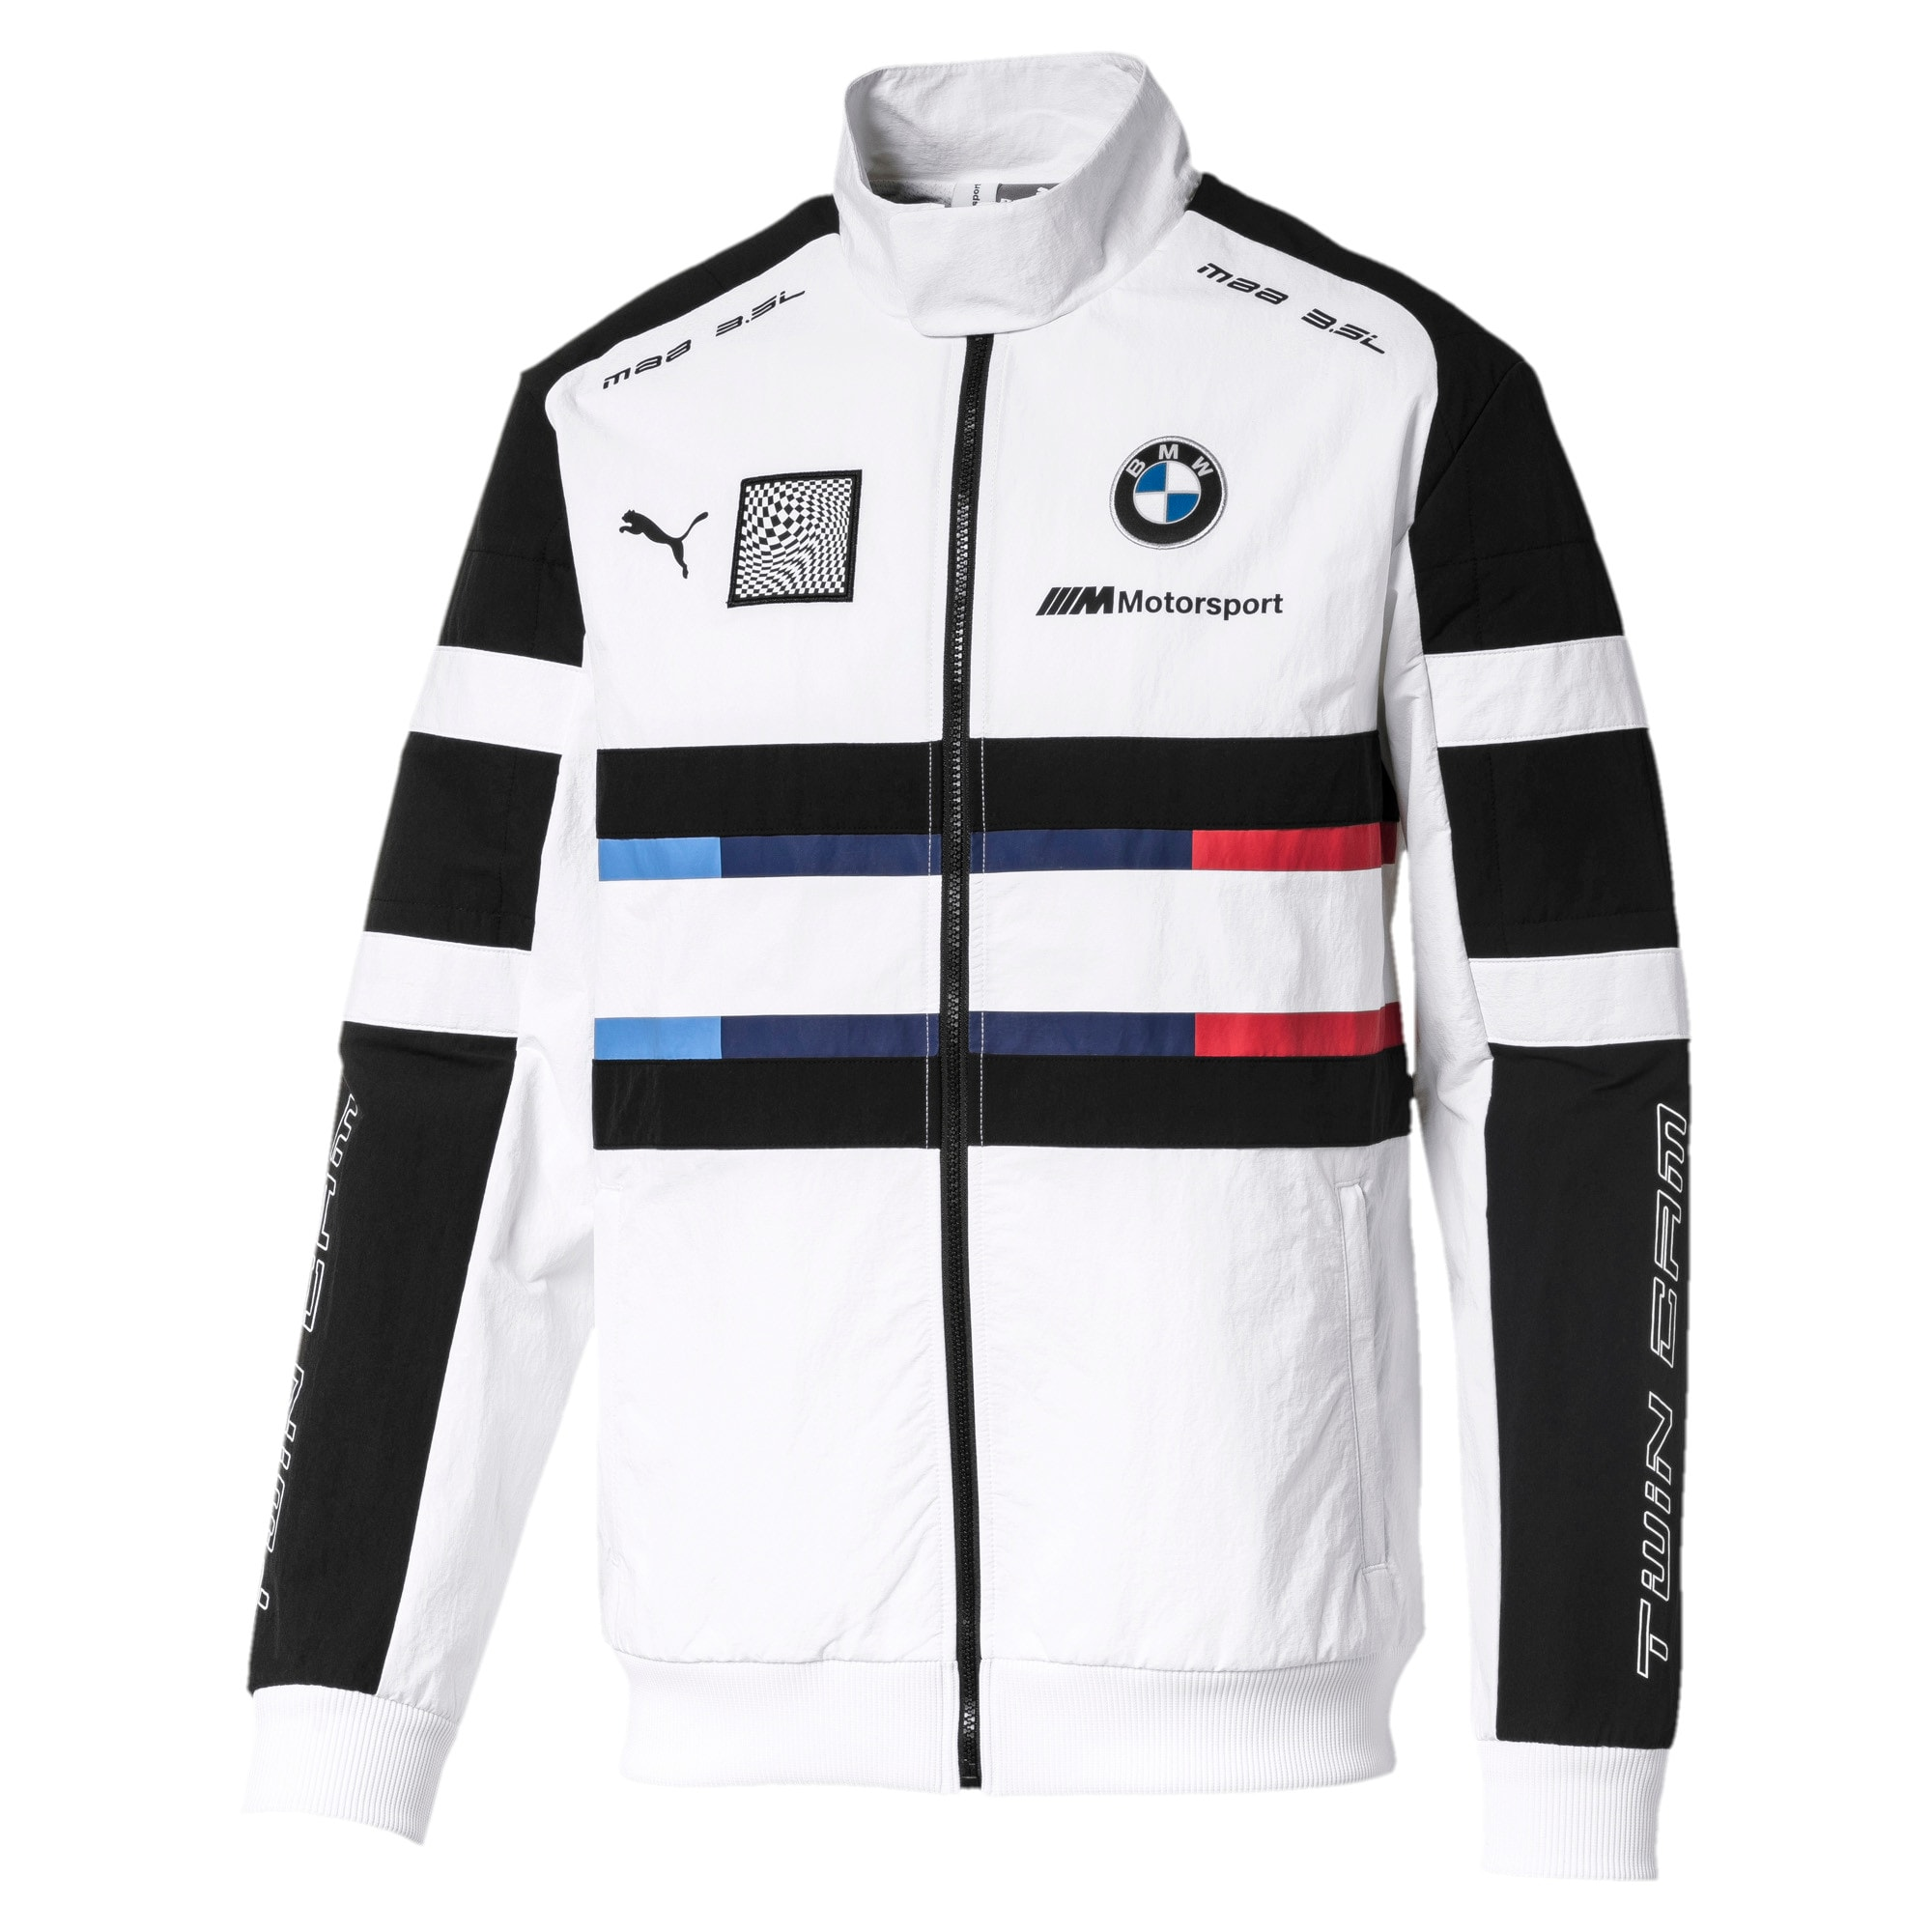 Thumbnail 1 of BMW Motorsport Street Woven Men's Jacket, Puma White, medium